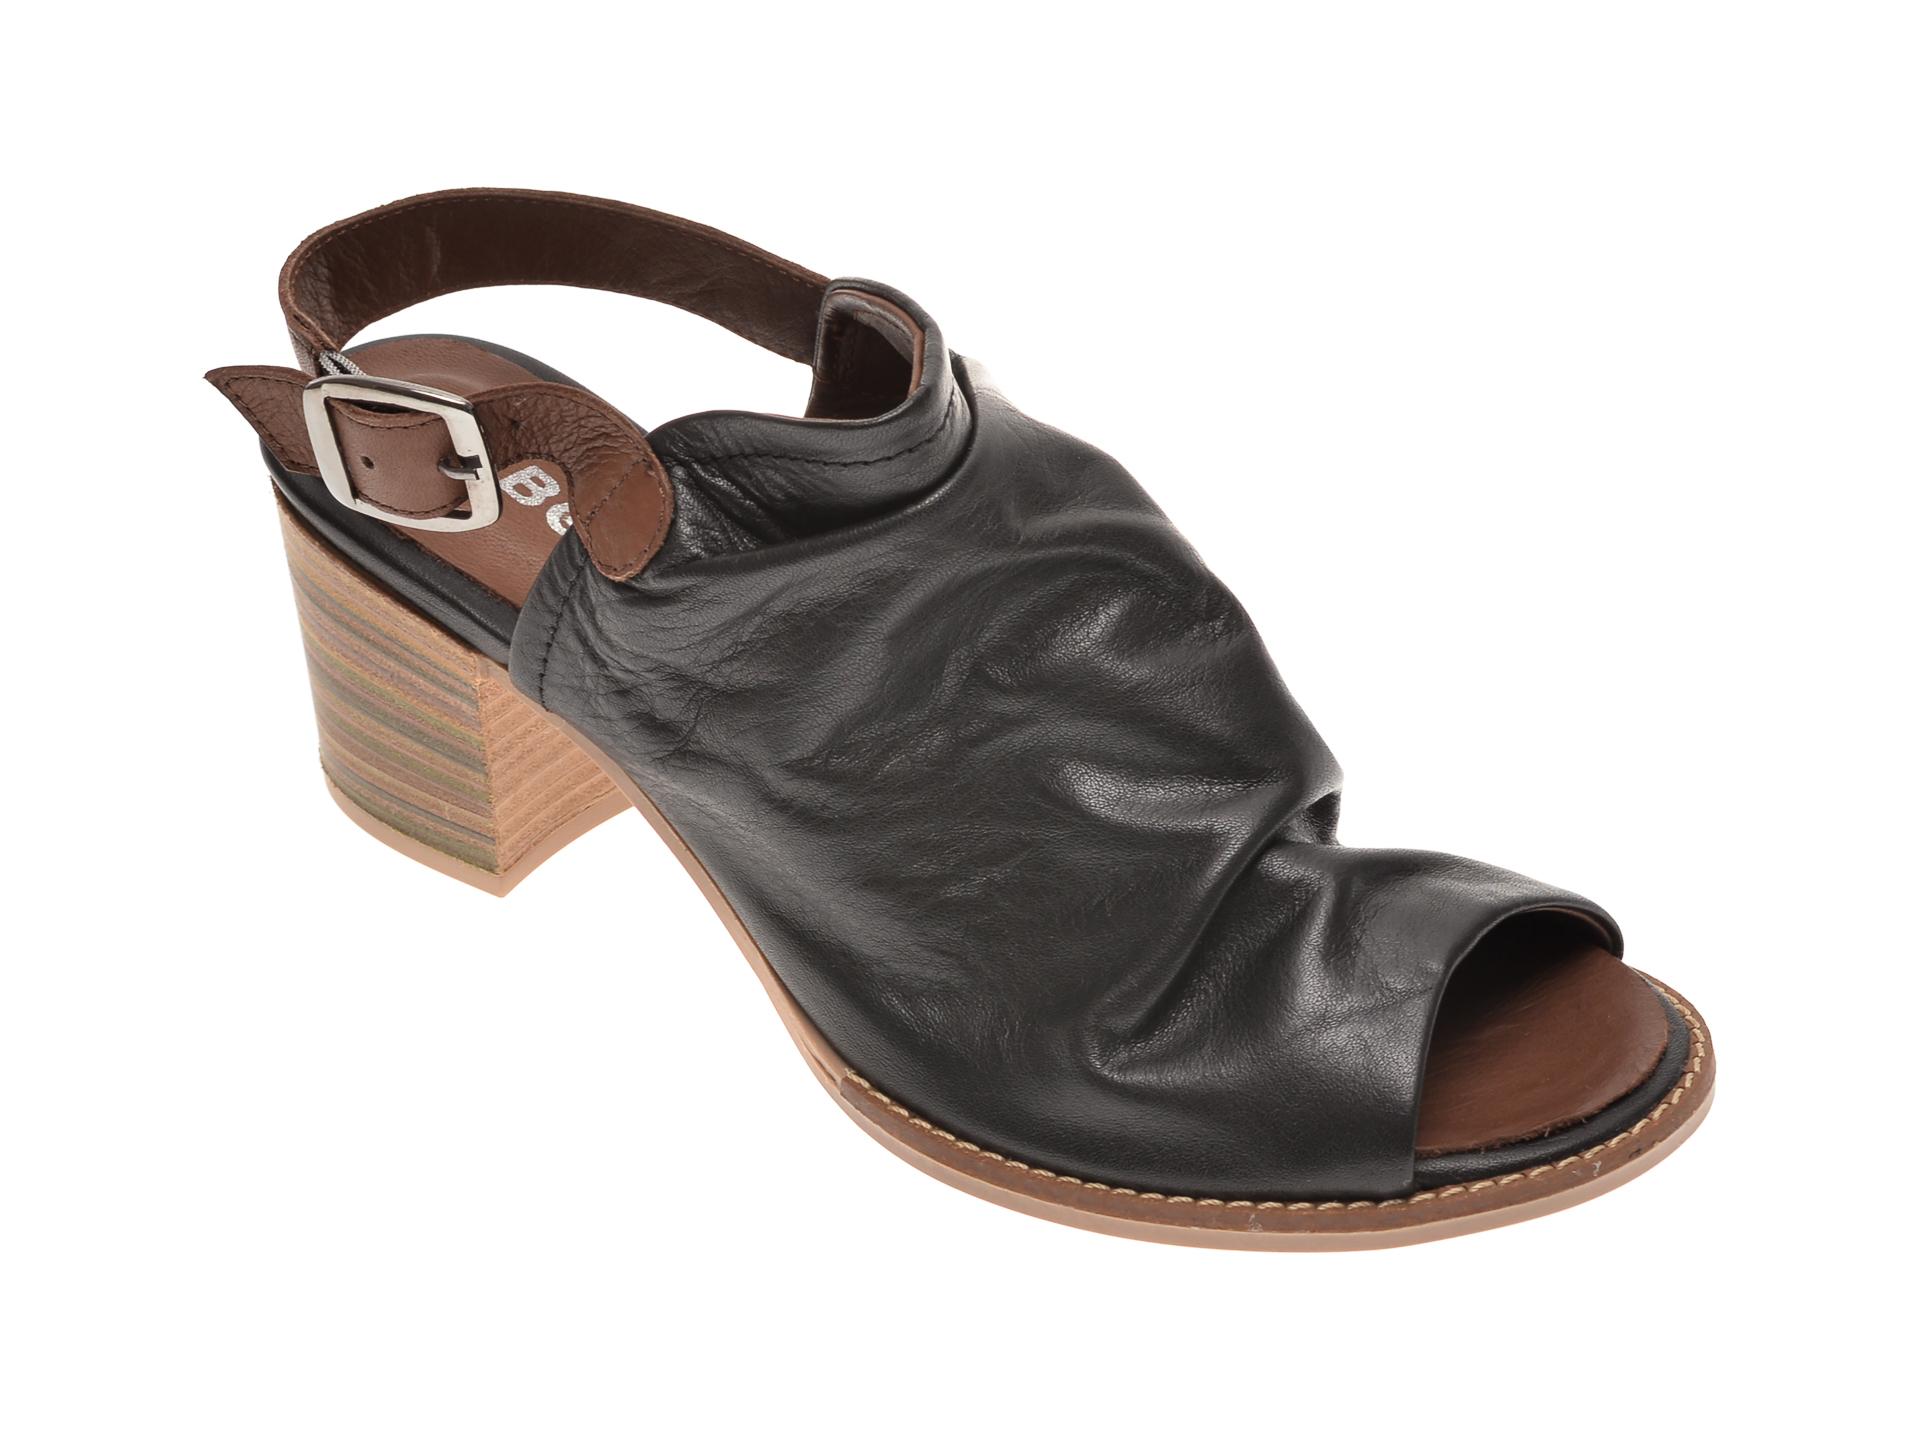 Sandale BABOOS negre, 1702, din piele naturala imagine otter.ro 2021